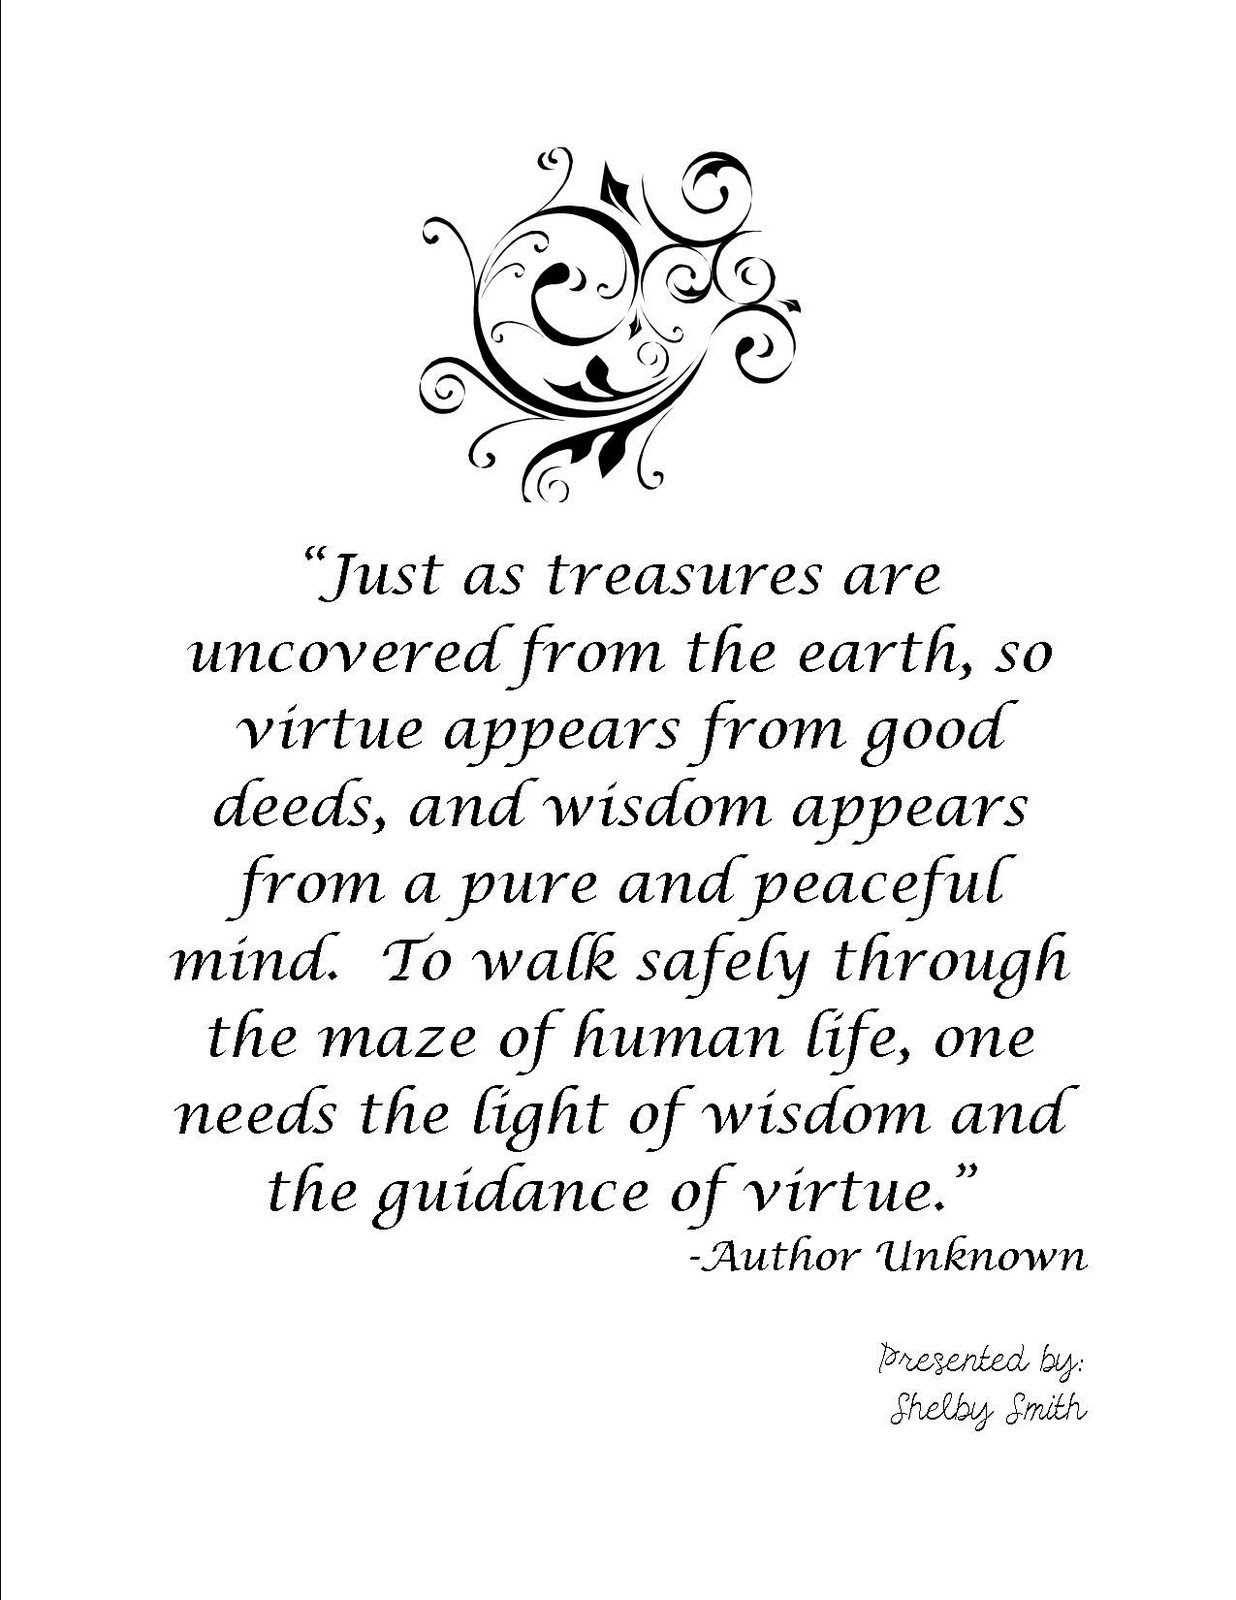 DBQ #3 Thomas Jefferson and Philosophical Consistency